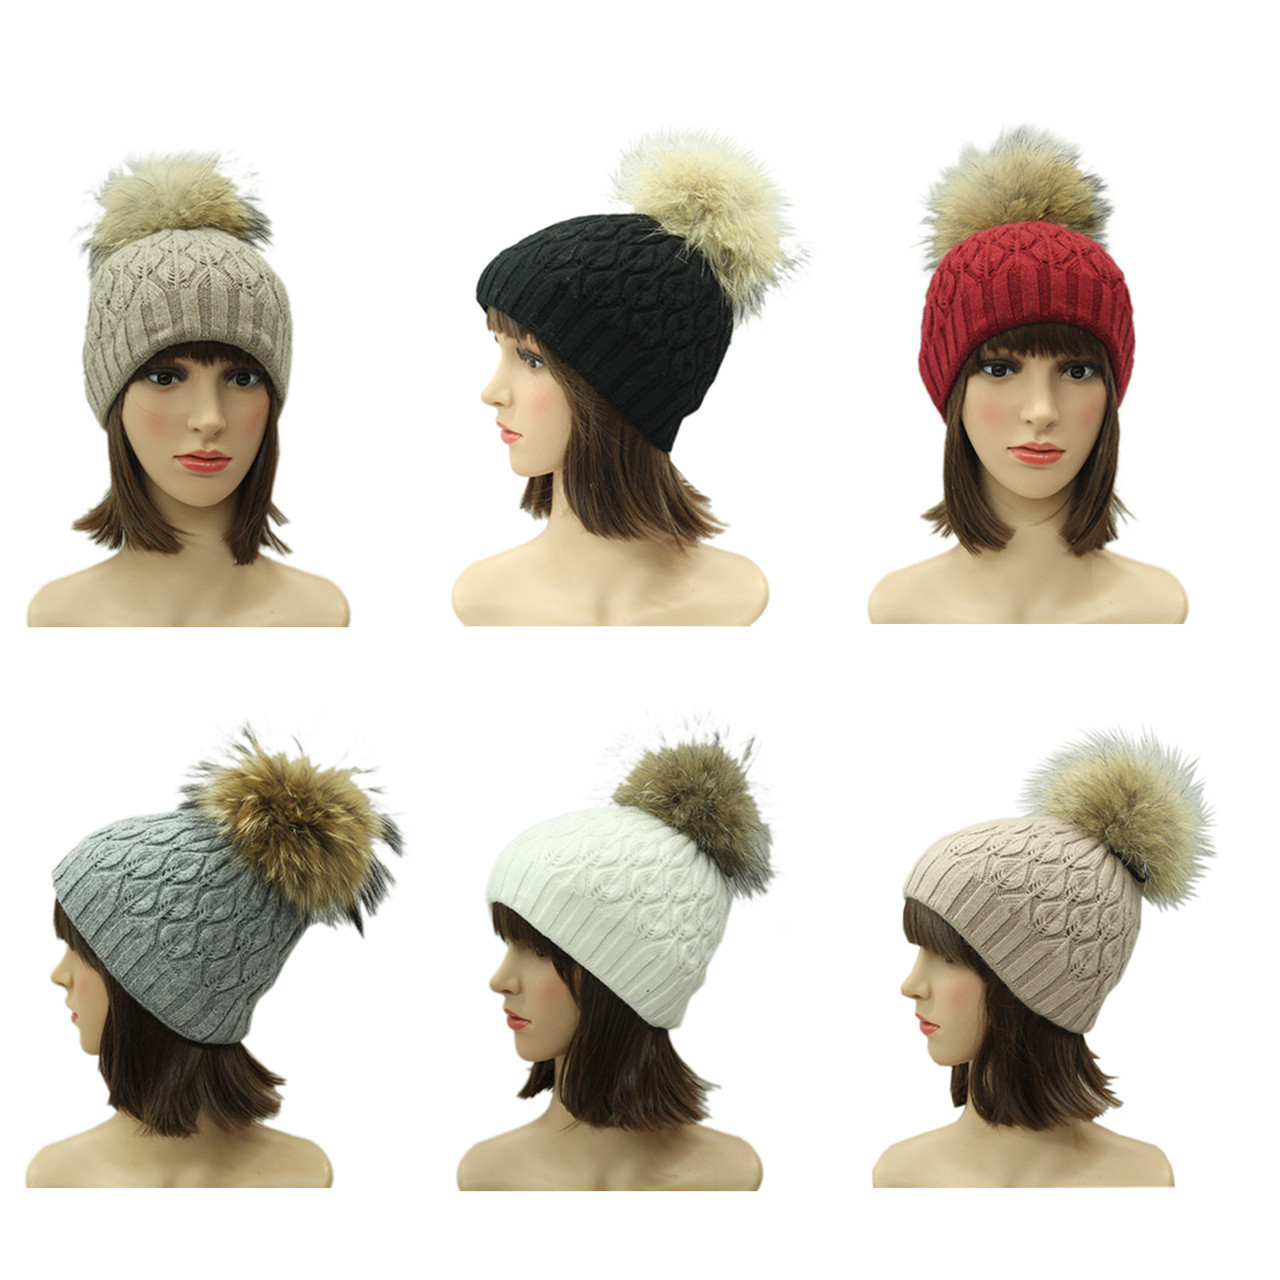 44149cdd8f9 Lady s Real Raccoon Fur Pom Pom Hat (Removable )H214 - Polyfashion ...